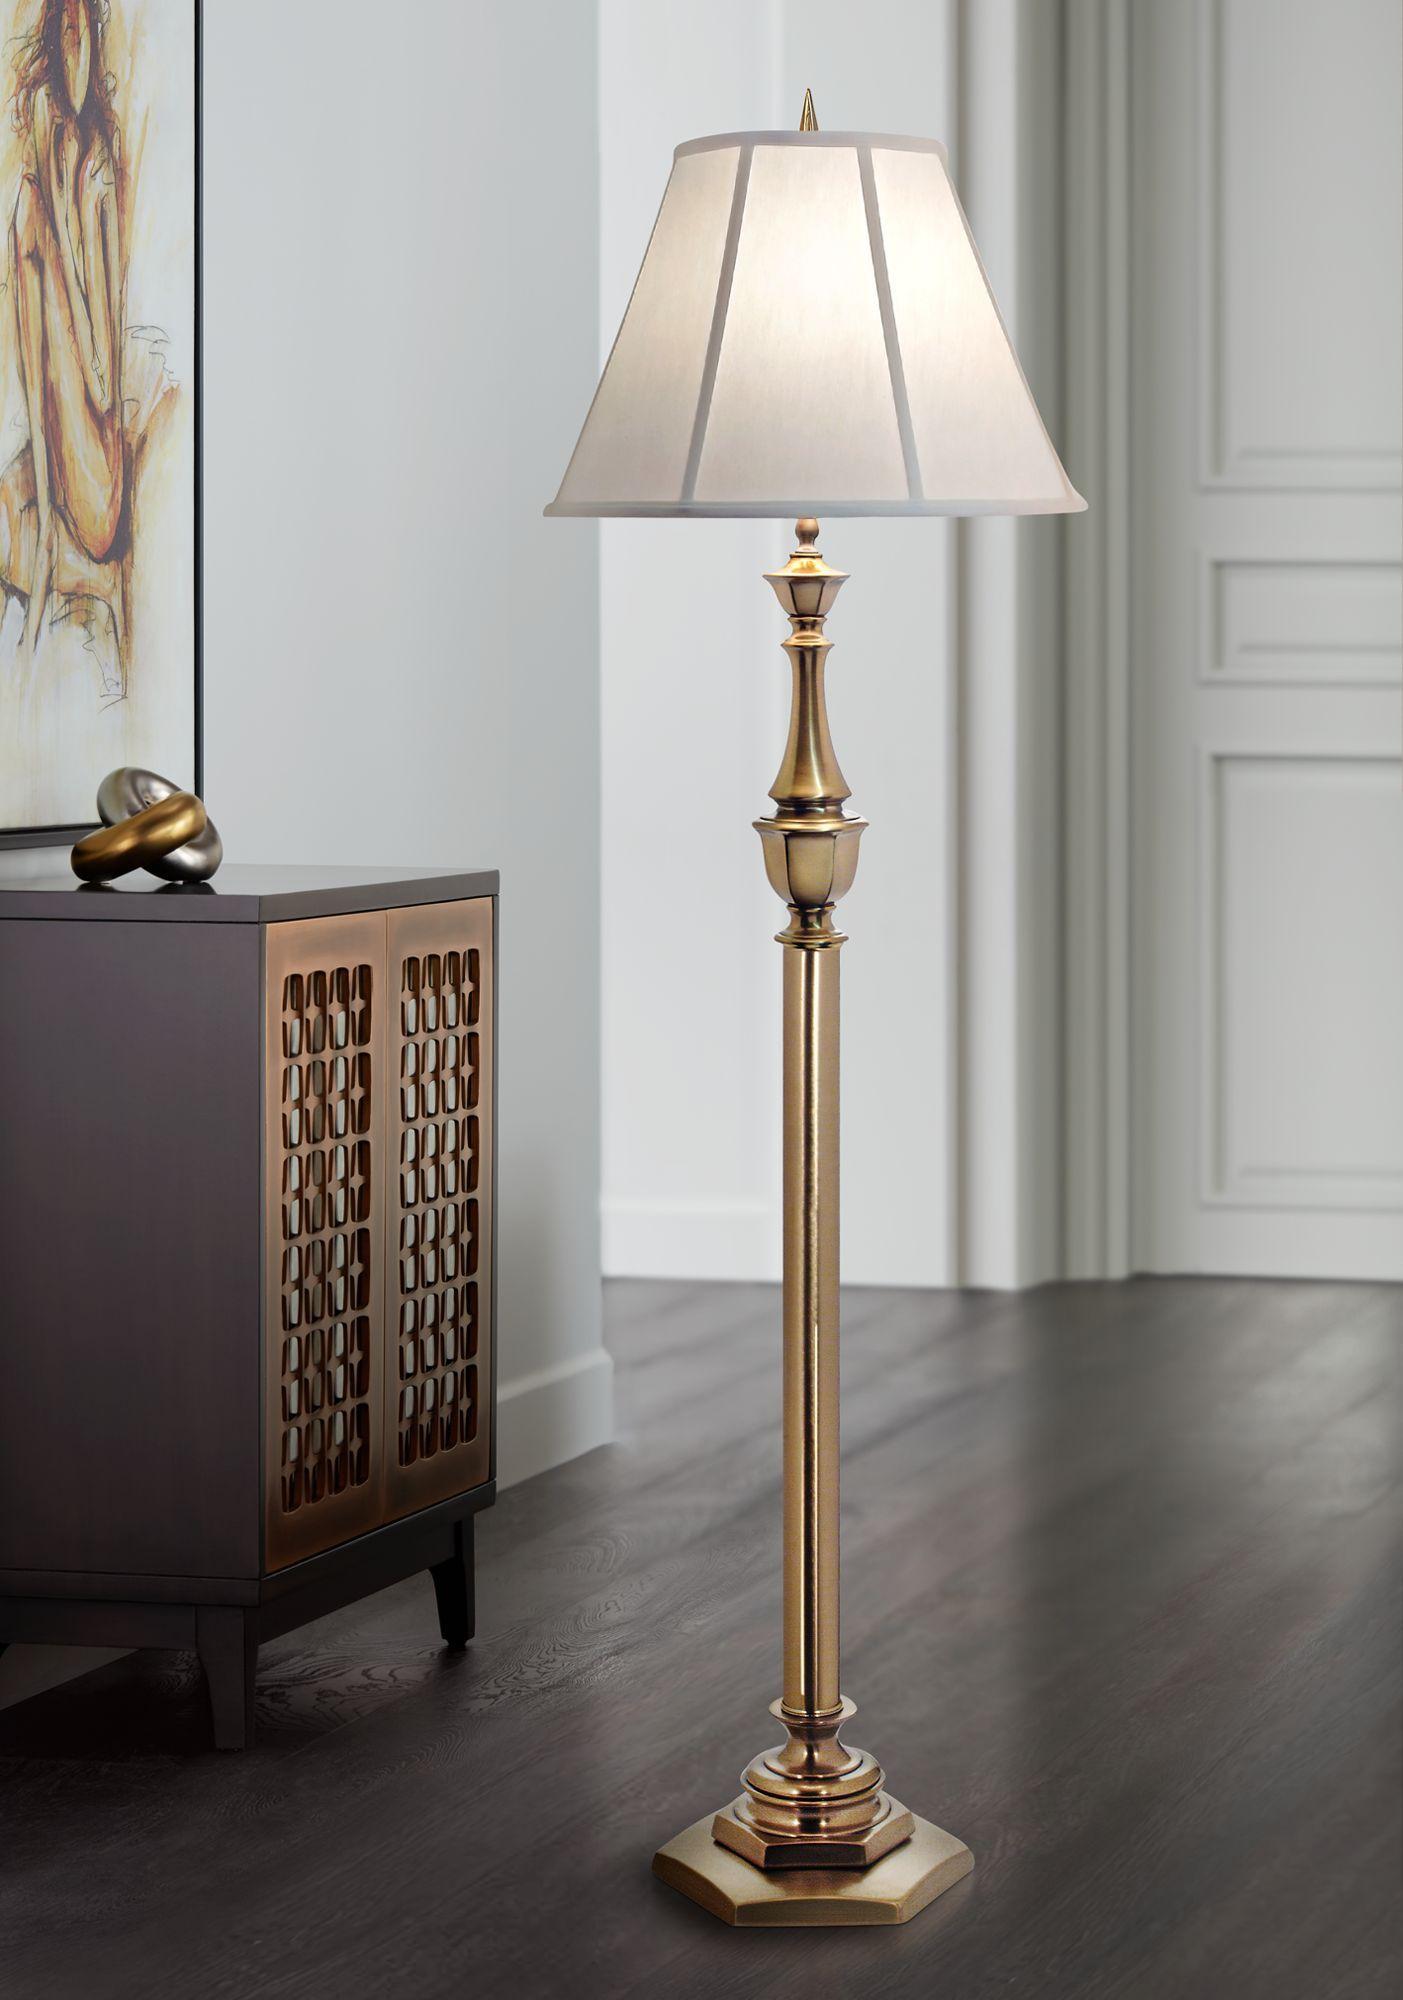 Stiffel Brass Floor Lamp A Type Of Traditional Lamp Antique Brass Floor Lamp Antique Floor Lamps Floor Lamp